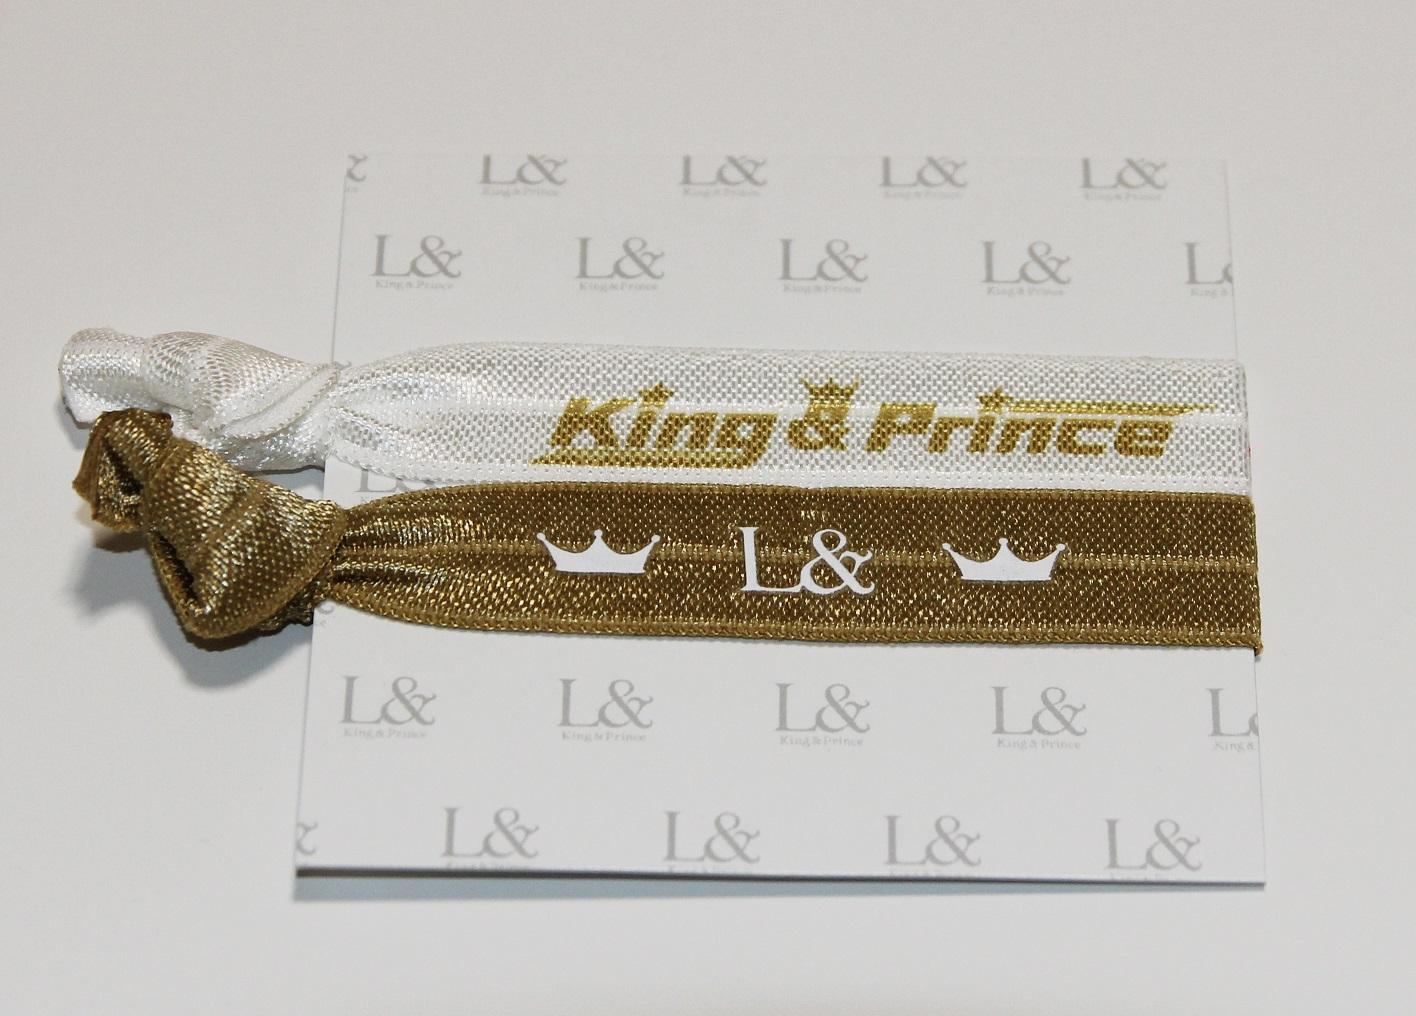 L キンプリ piquora.com: king